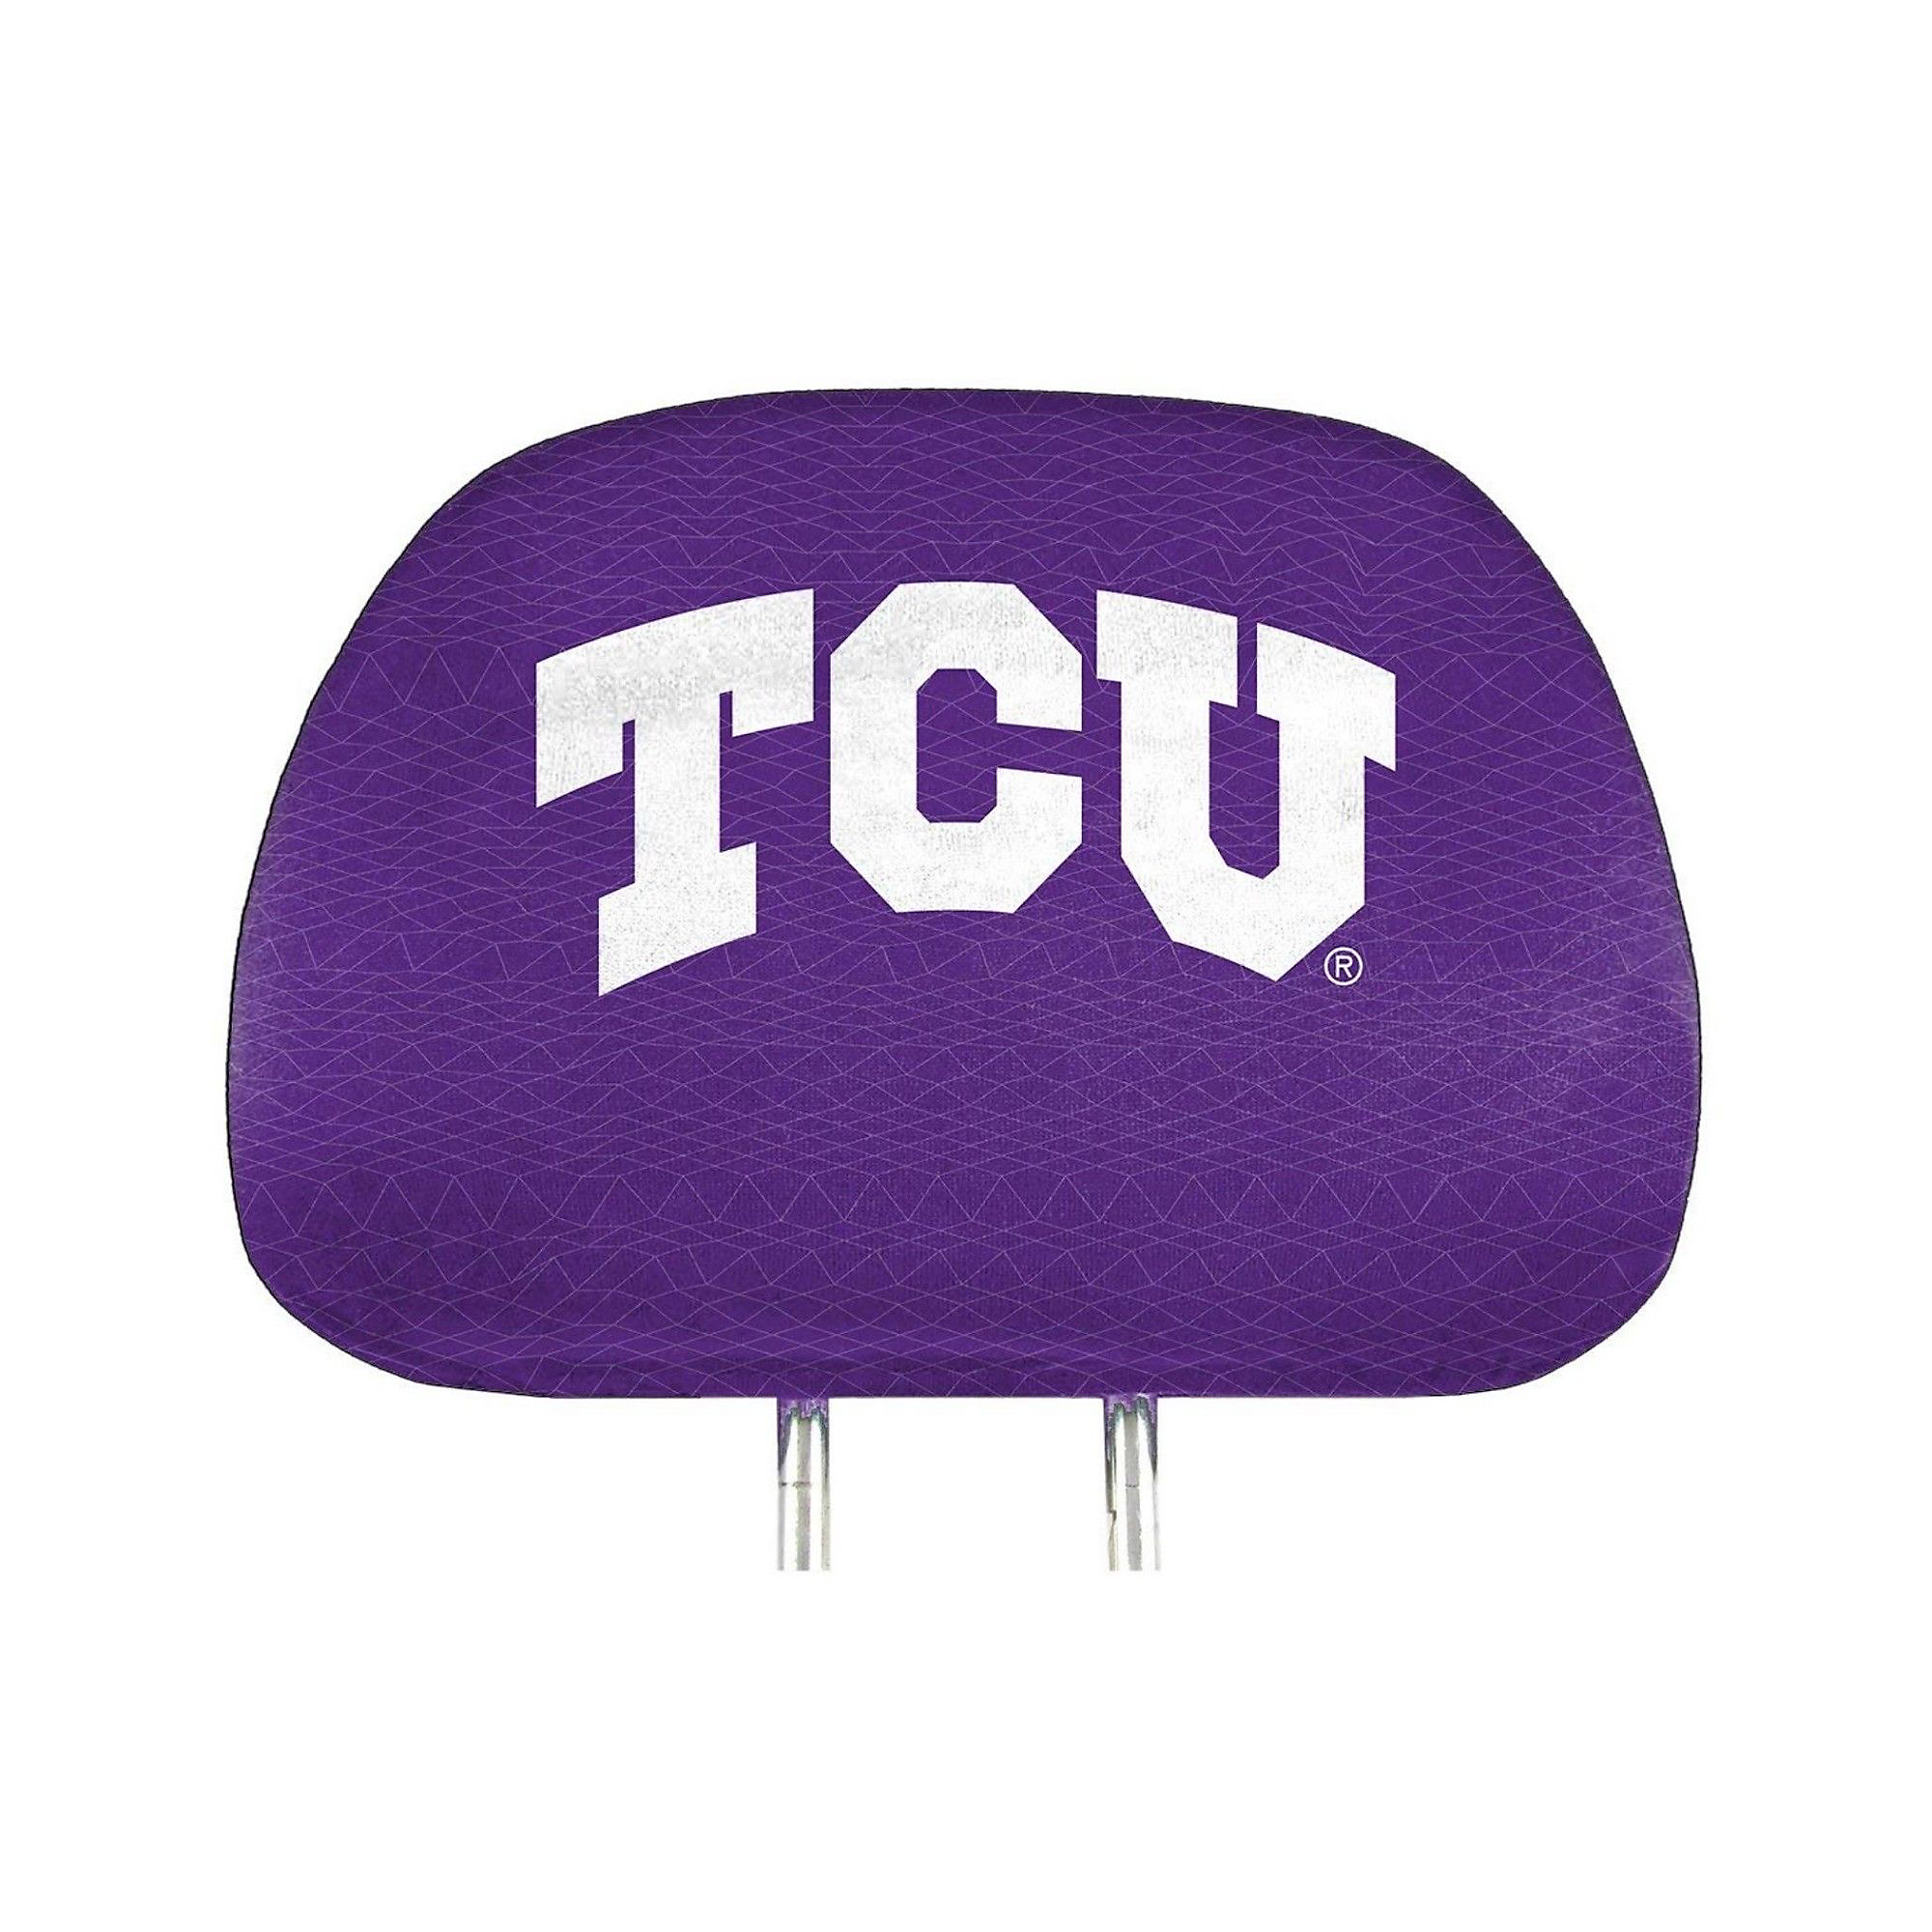 TCU Horned Frogs Printed Headrest Set